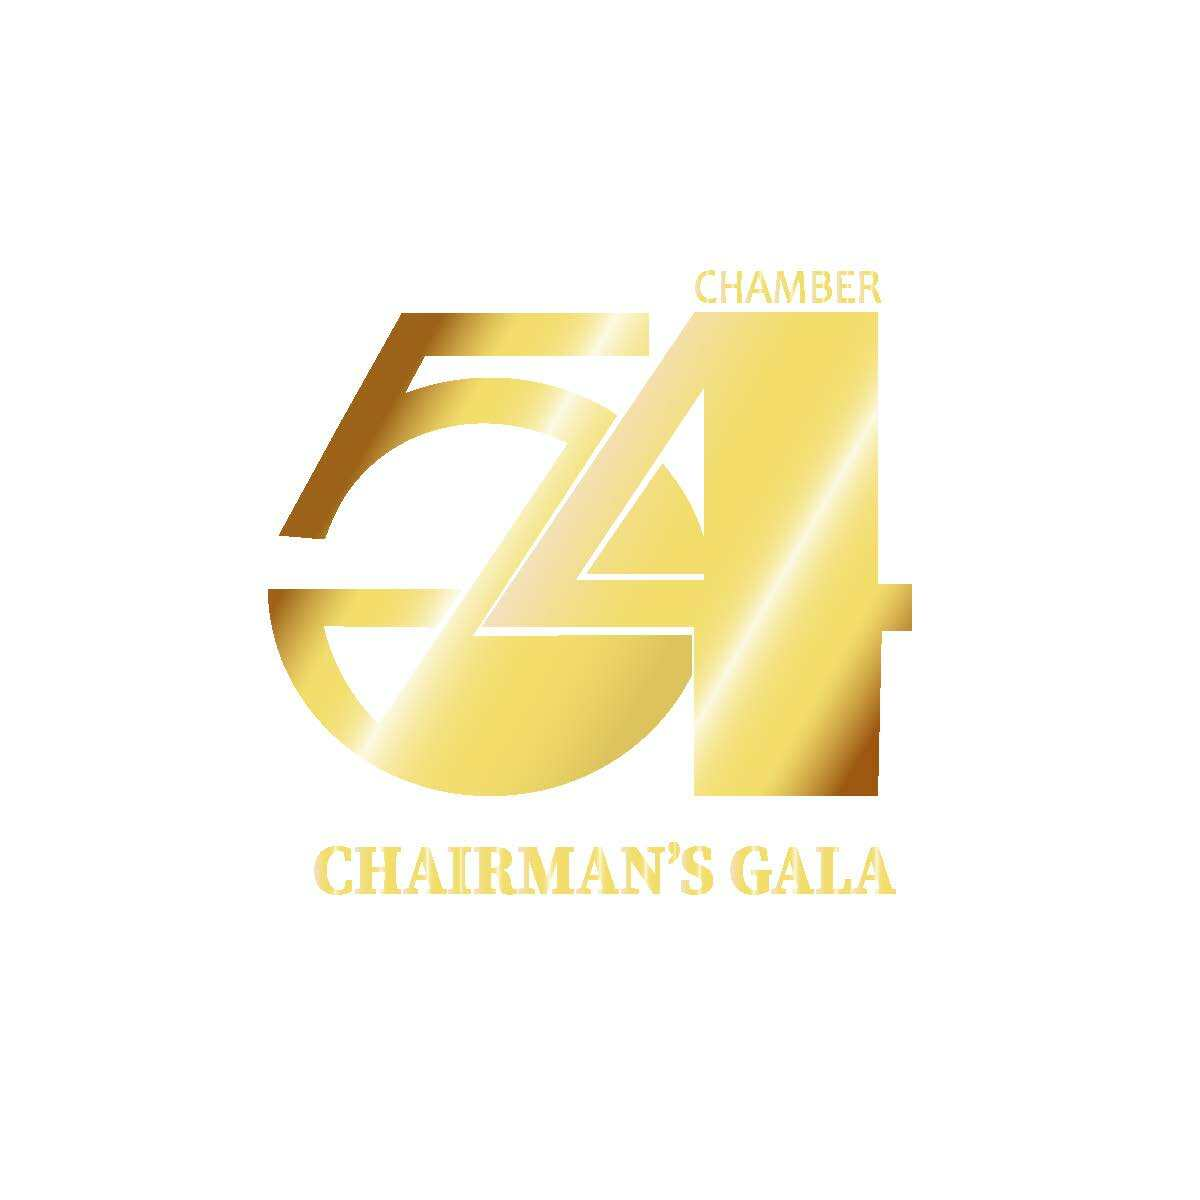 Gold Sponsor Chamber54 Gala GoldGala